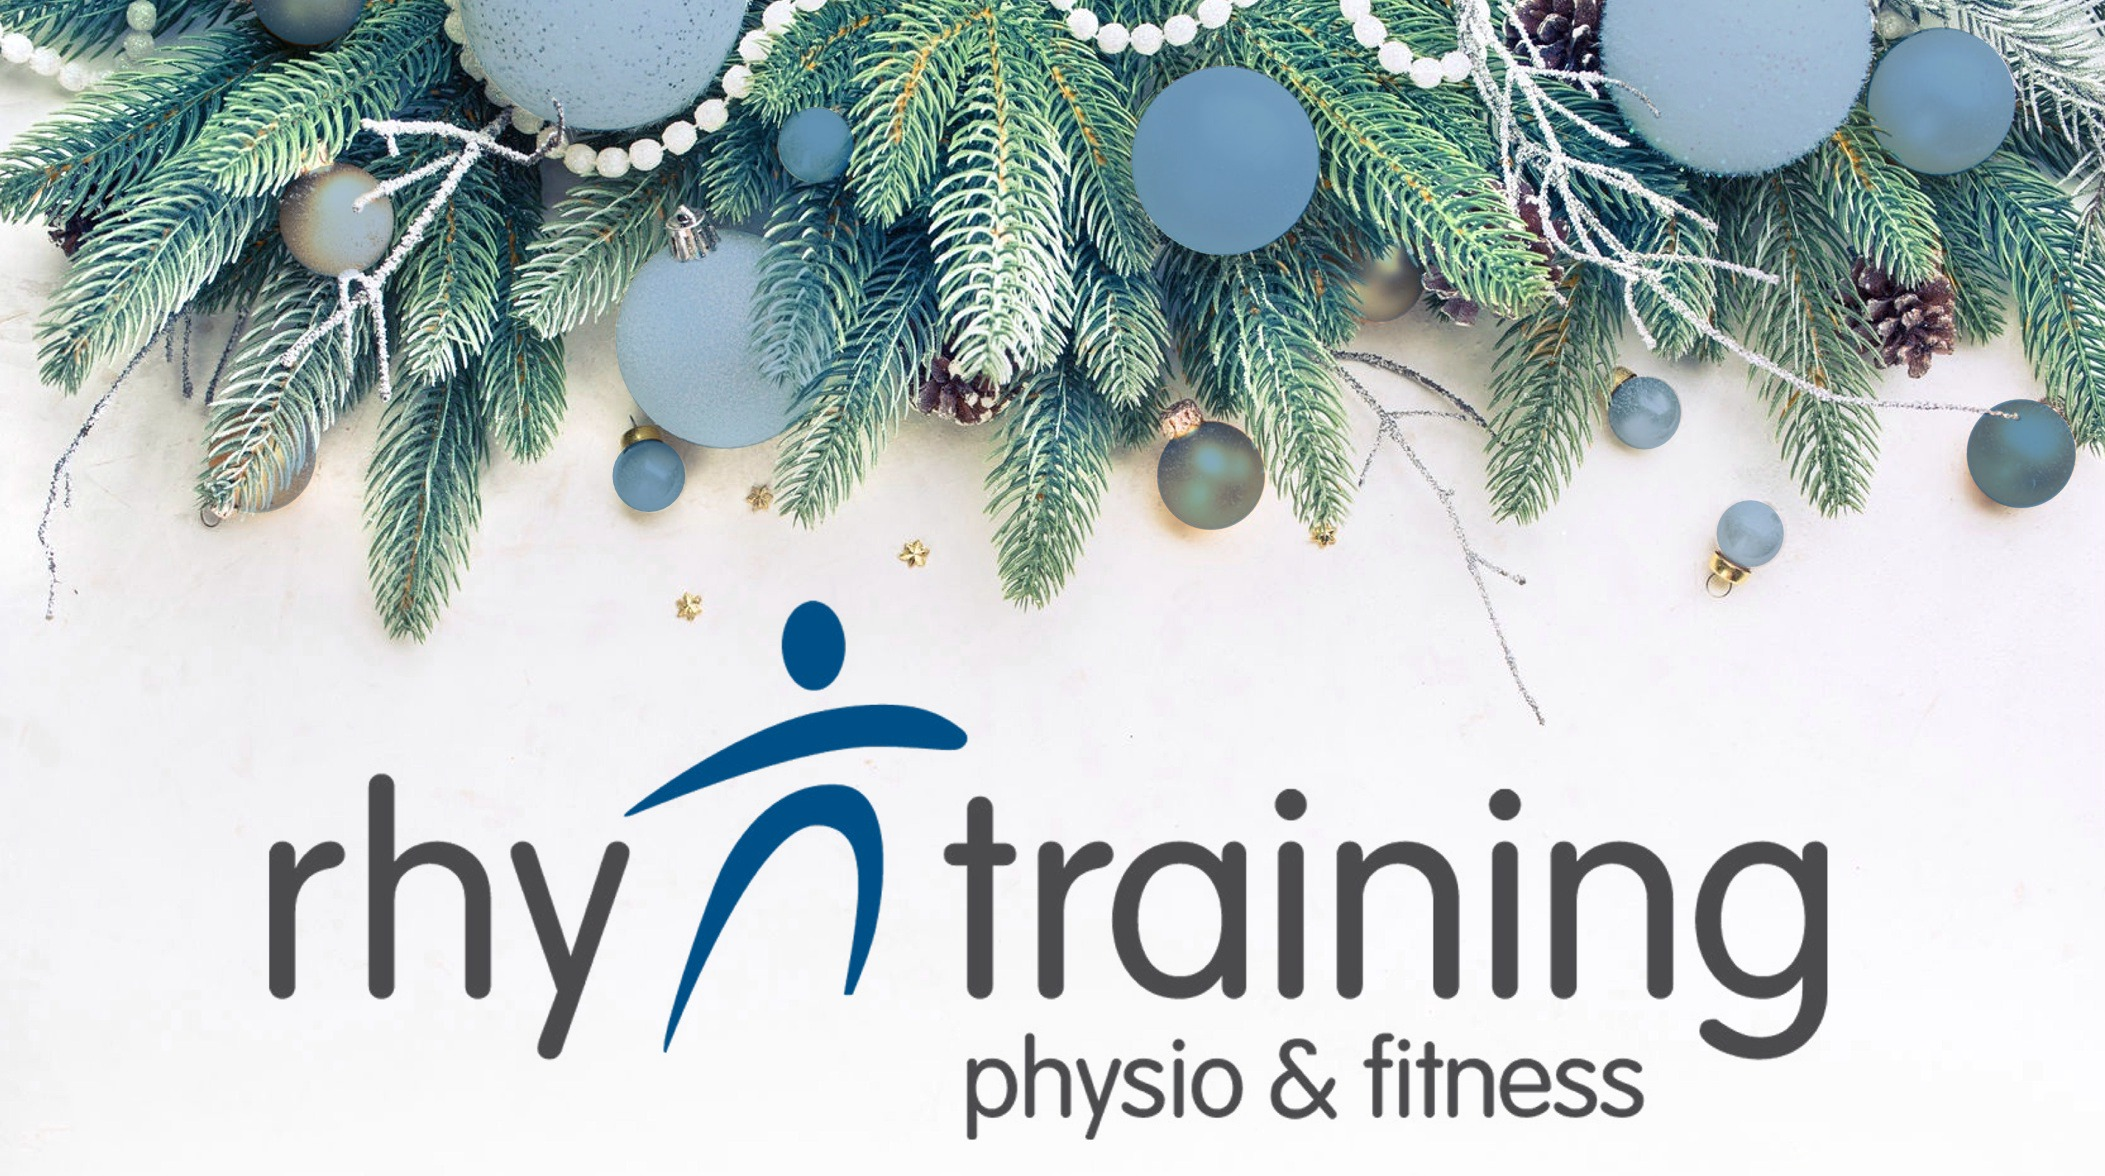 rhytraining physio & fitness stein am rhein personal training – jahresendprogramm